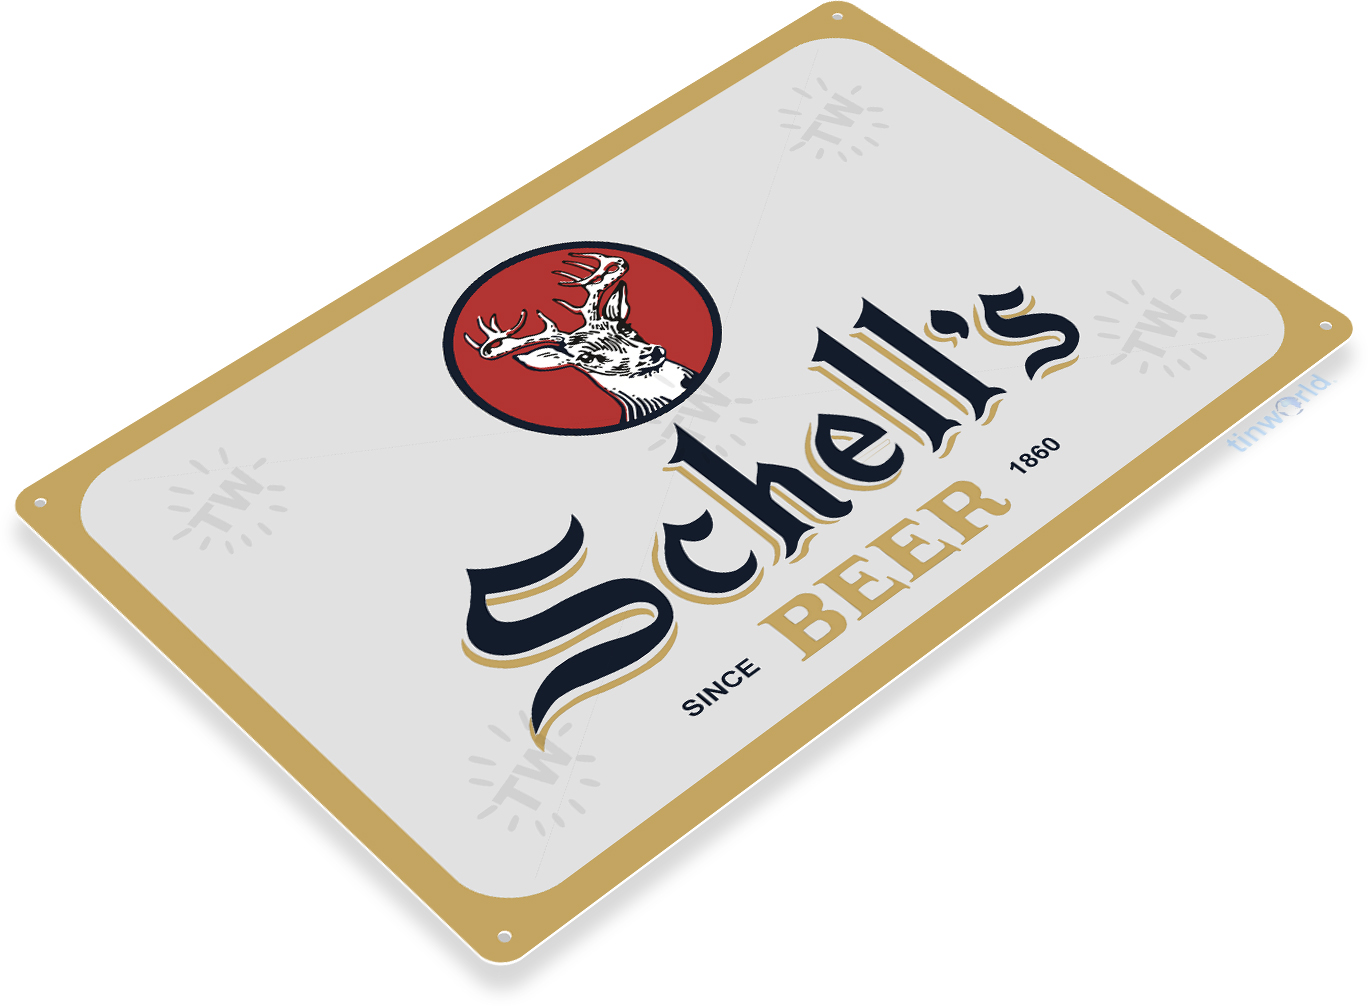 Beer Retro replica vintage style metal tin sign gift pub bar